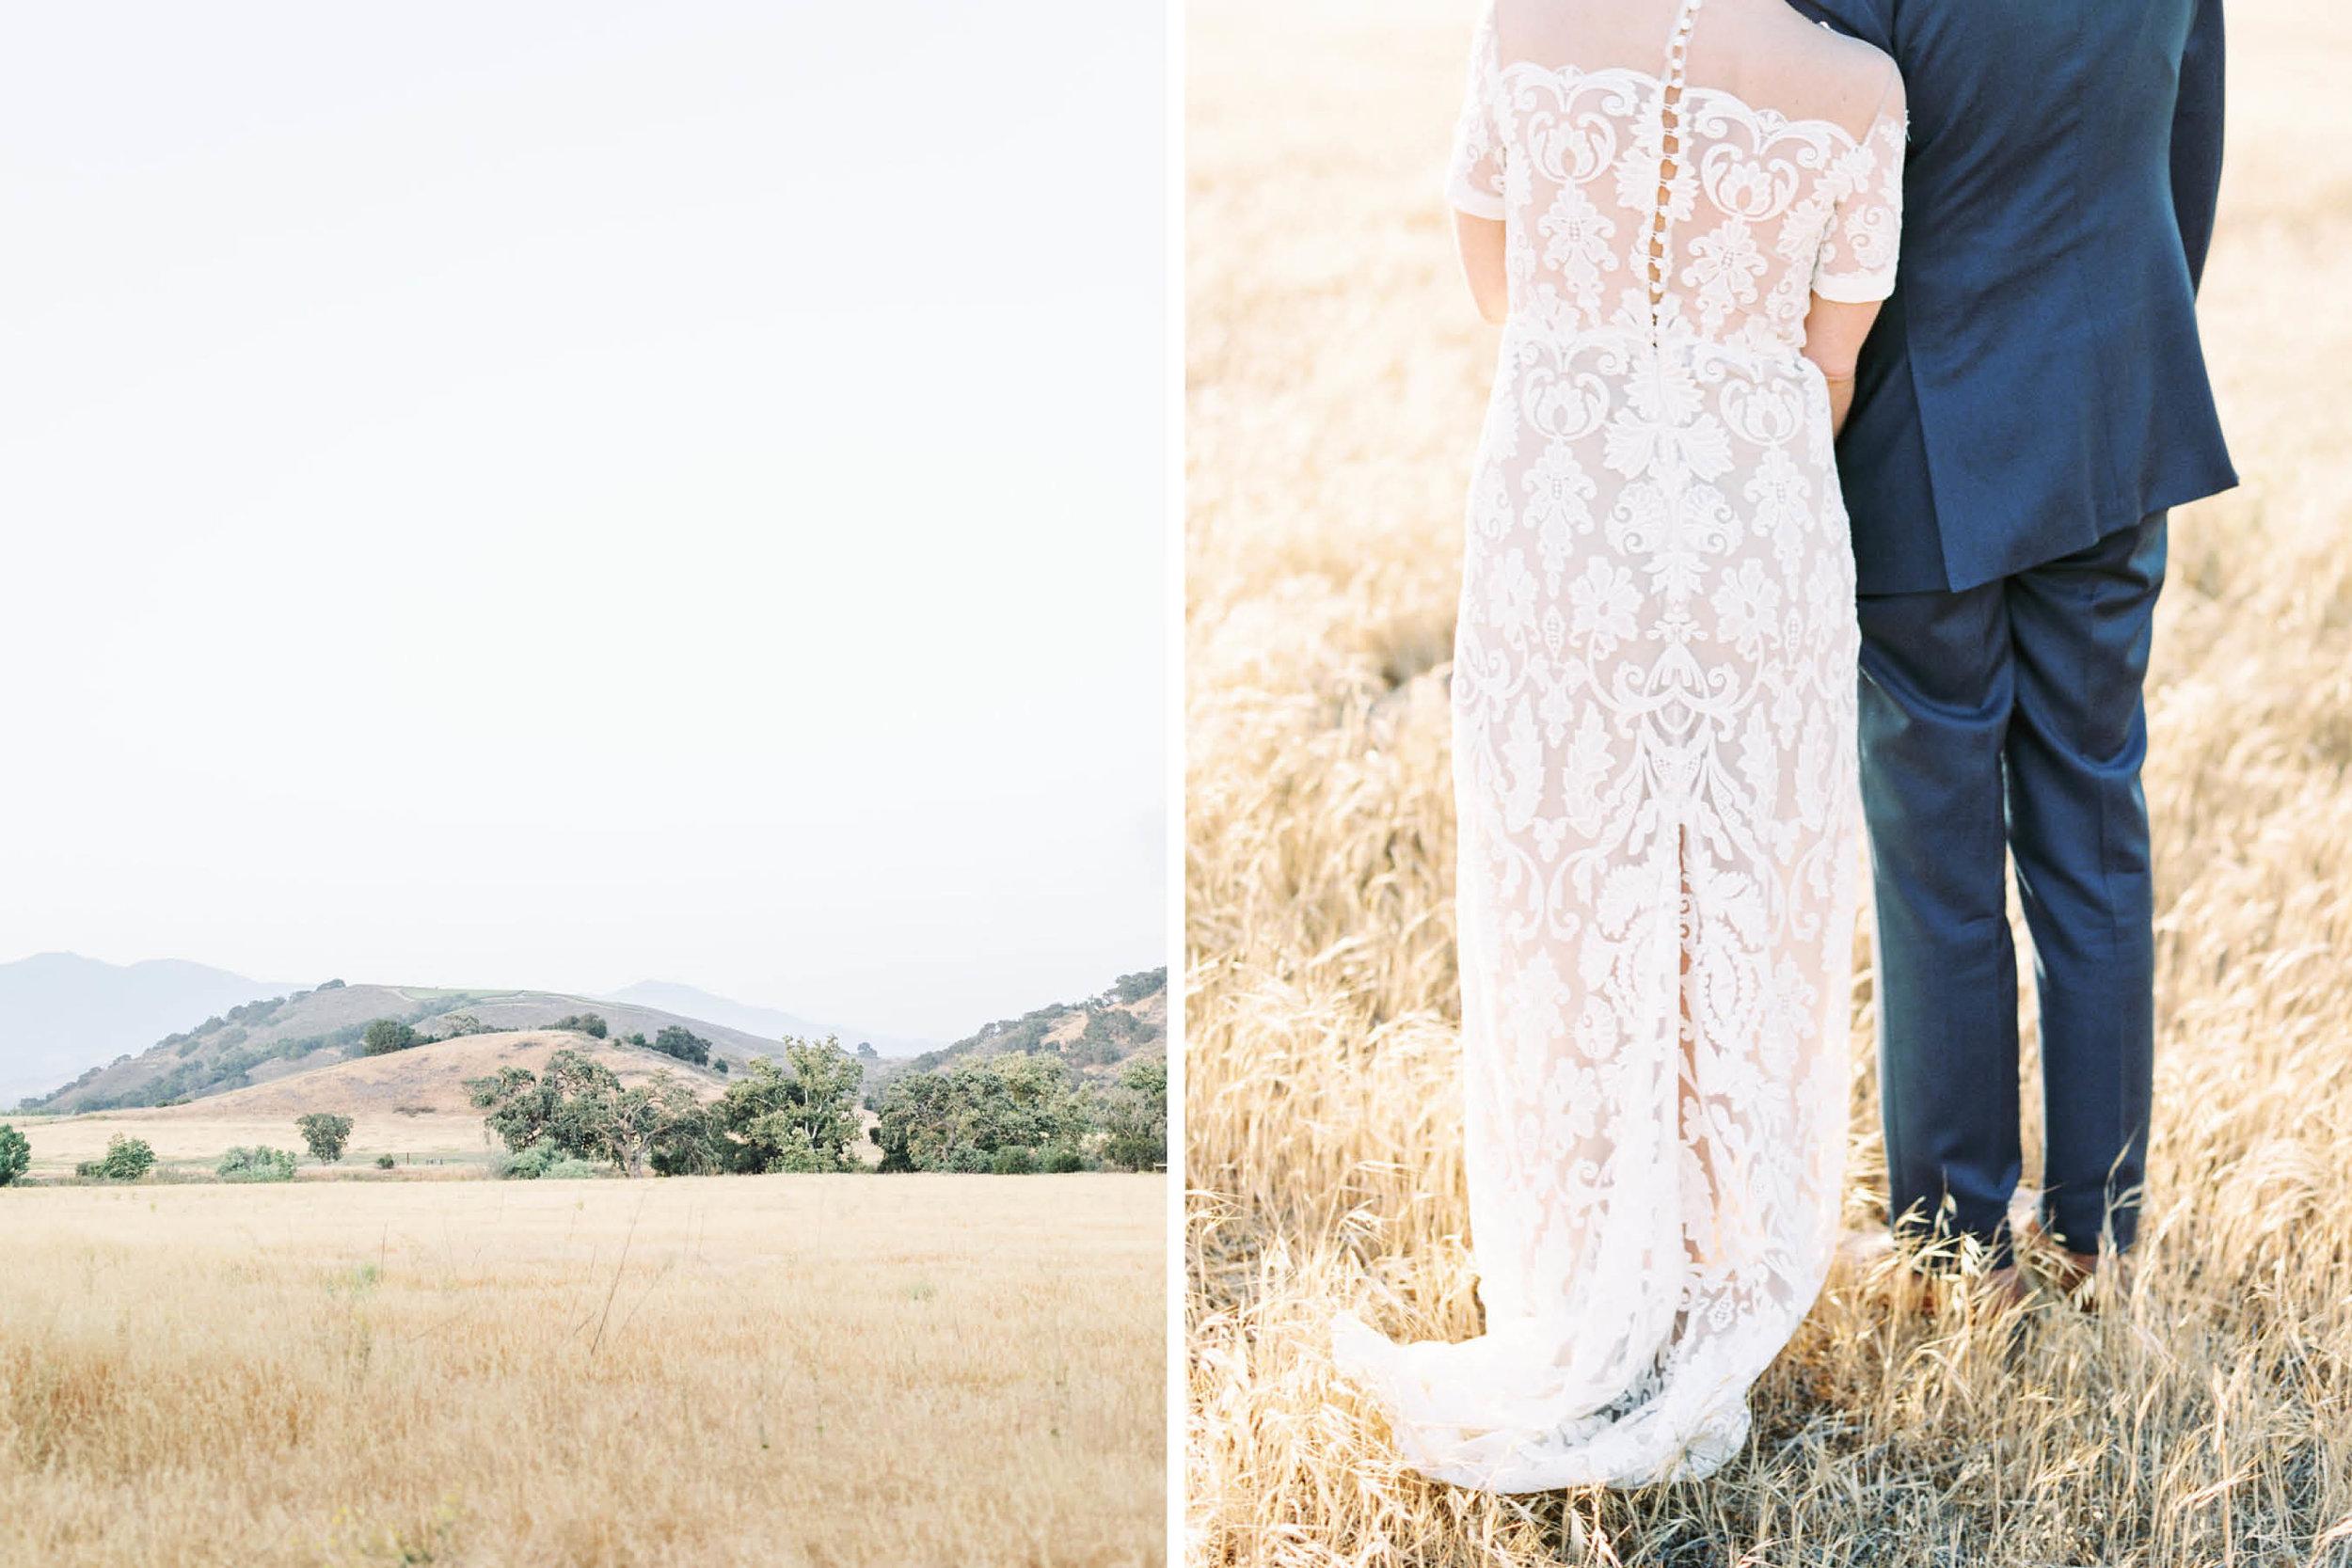 alegria-by-design-wedding-planner-planning-event-design-santa-barbara-day-of-coordinator-kestrel-park-santa-ynez-fields-castle-lavender-garden-mrs-box (50).jpg